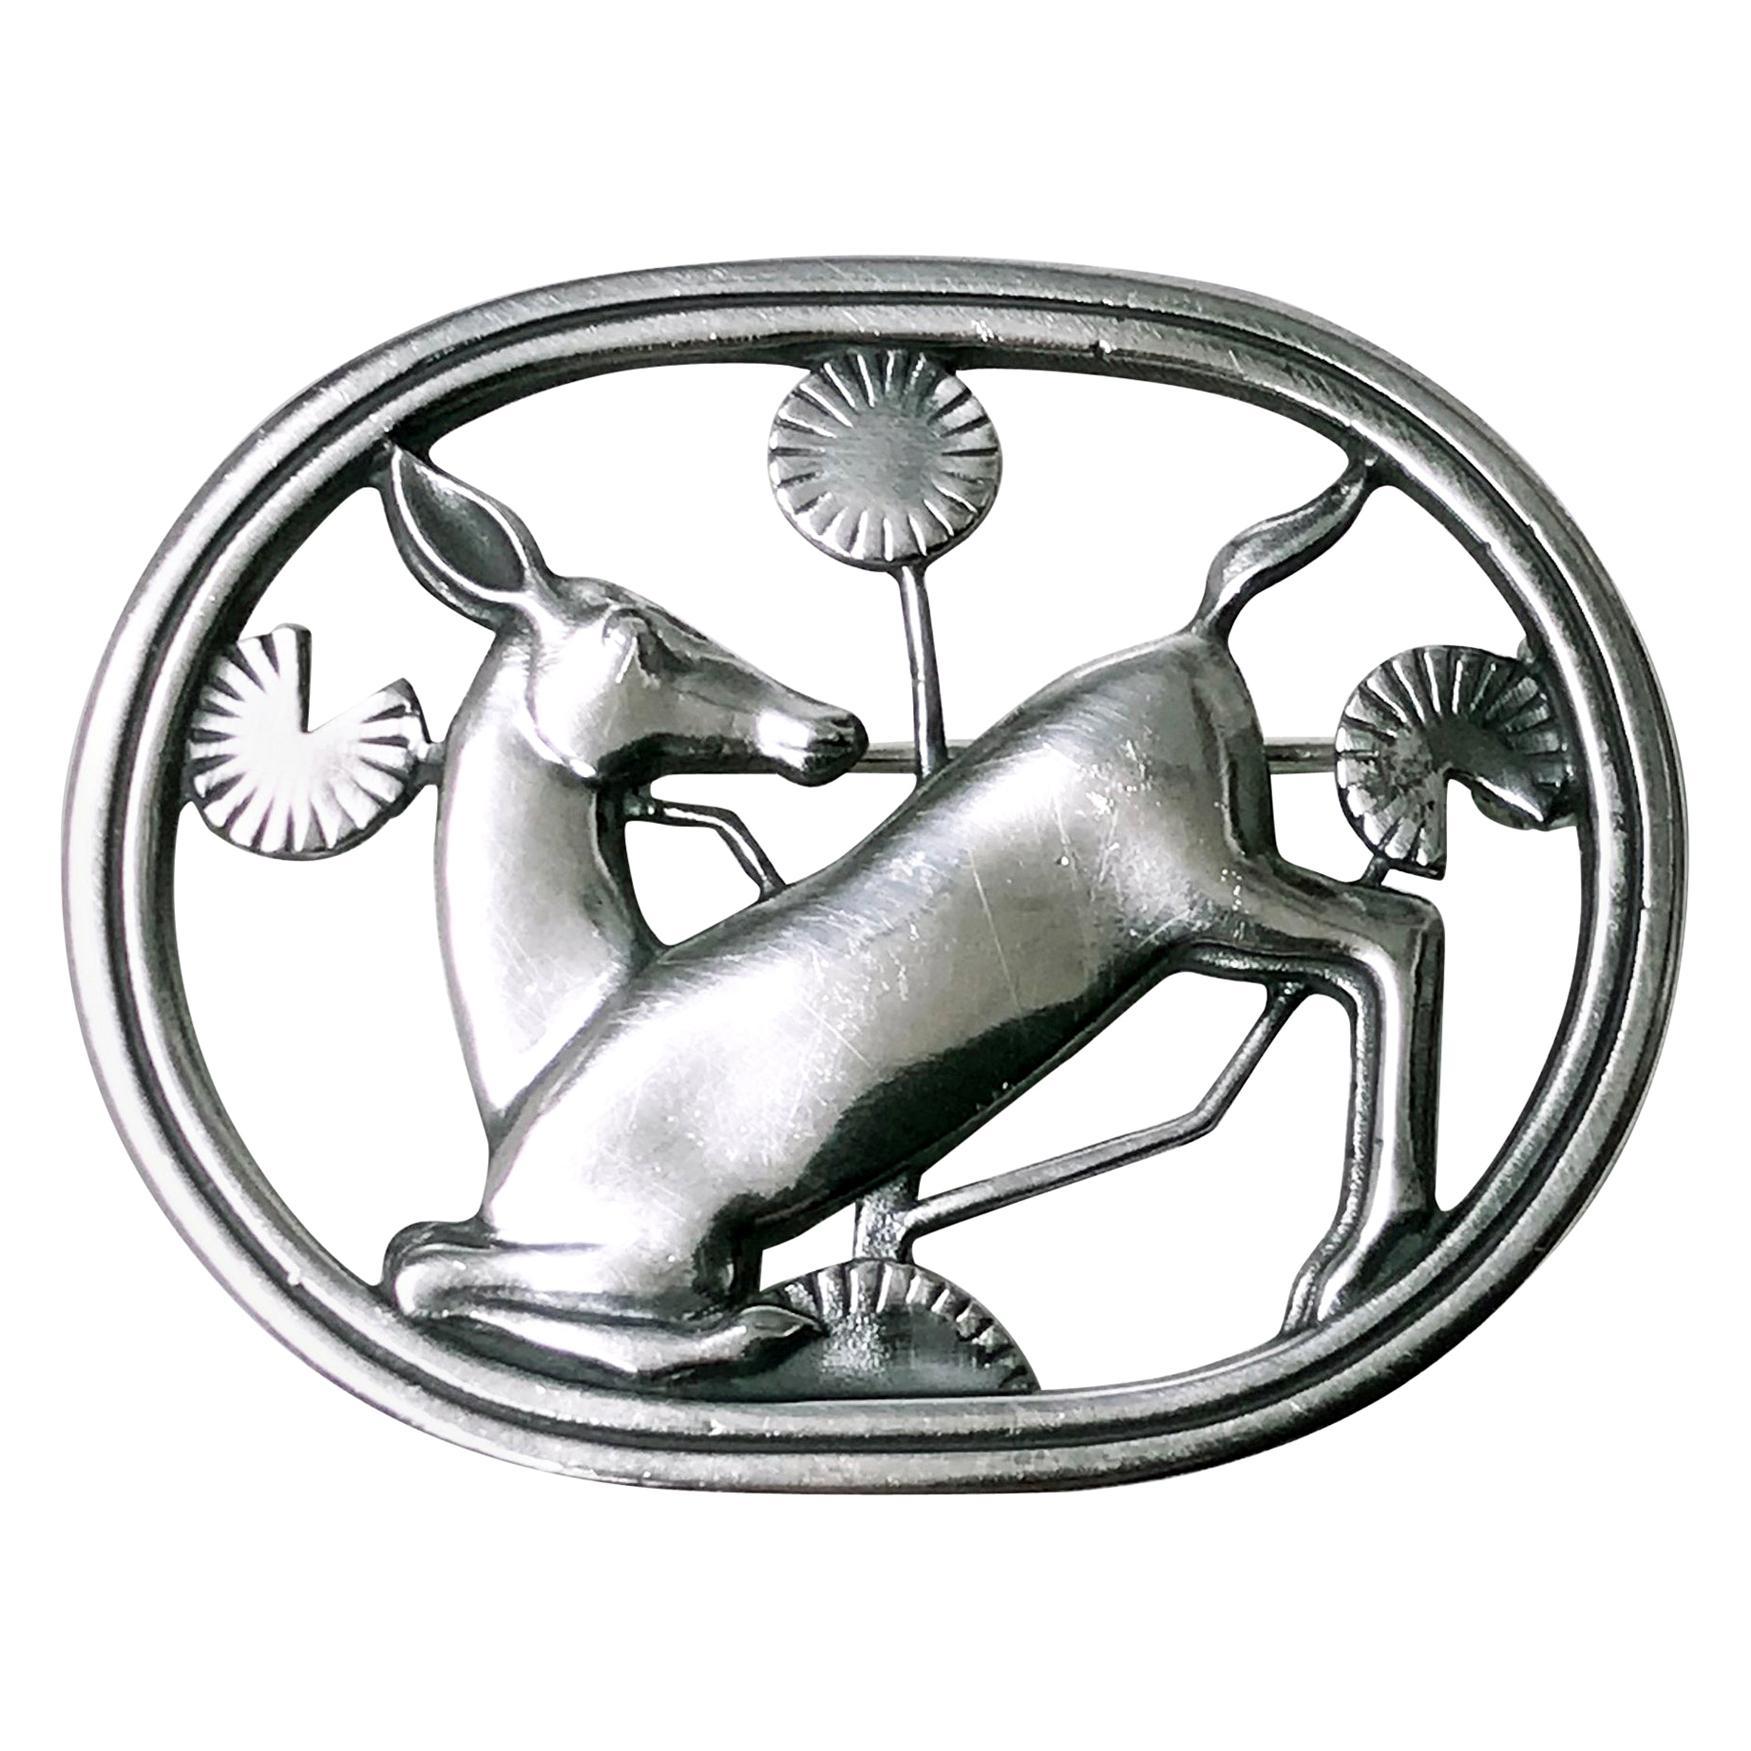 Georg Jensen Sterling Deer Brooch, Designed by Arno Malinowski